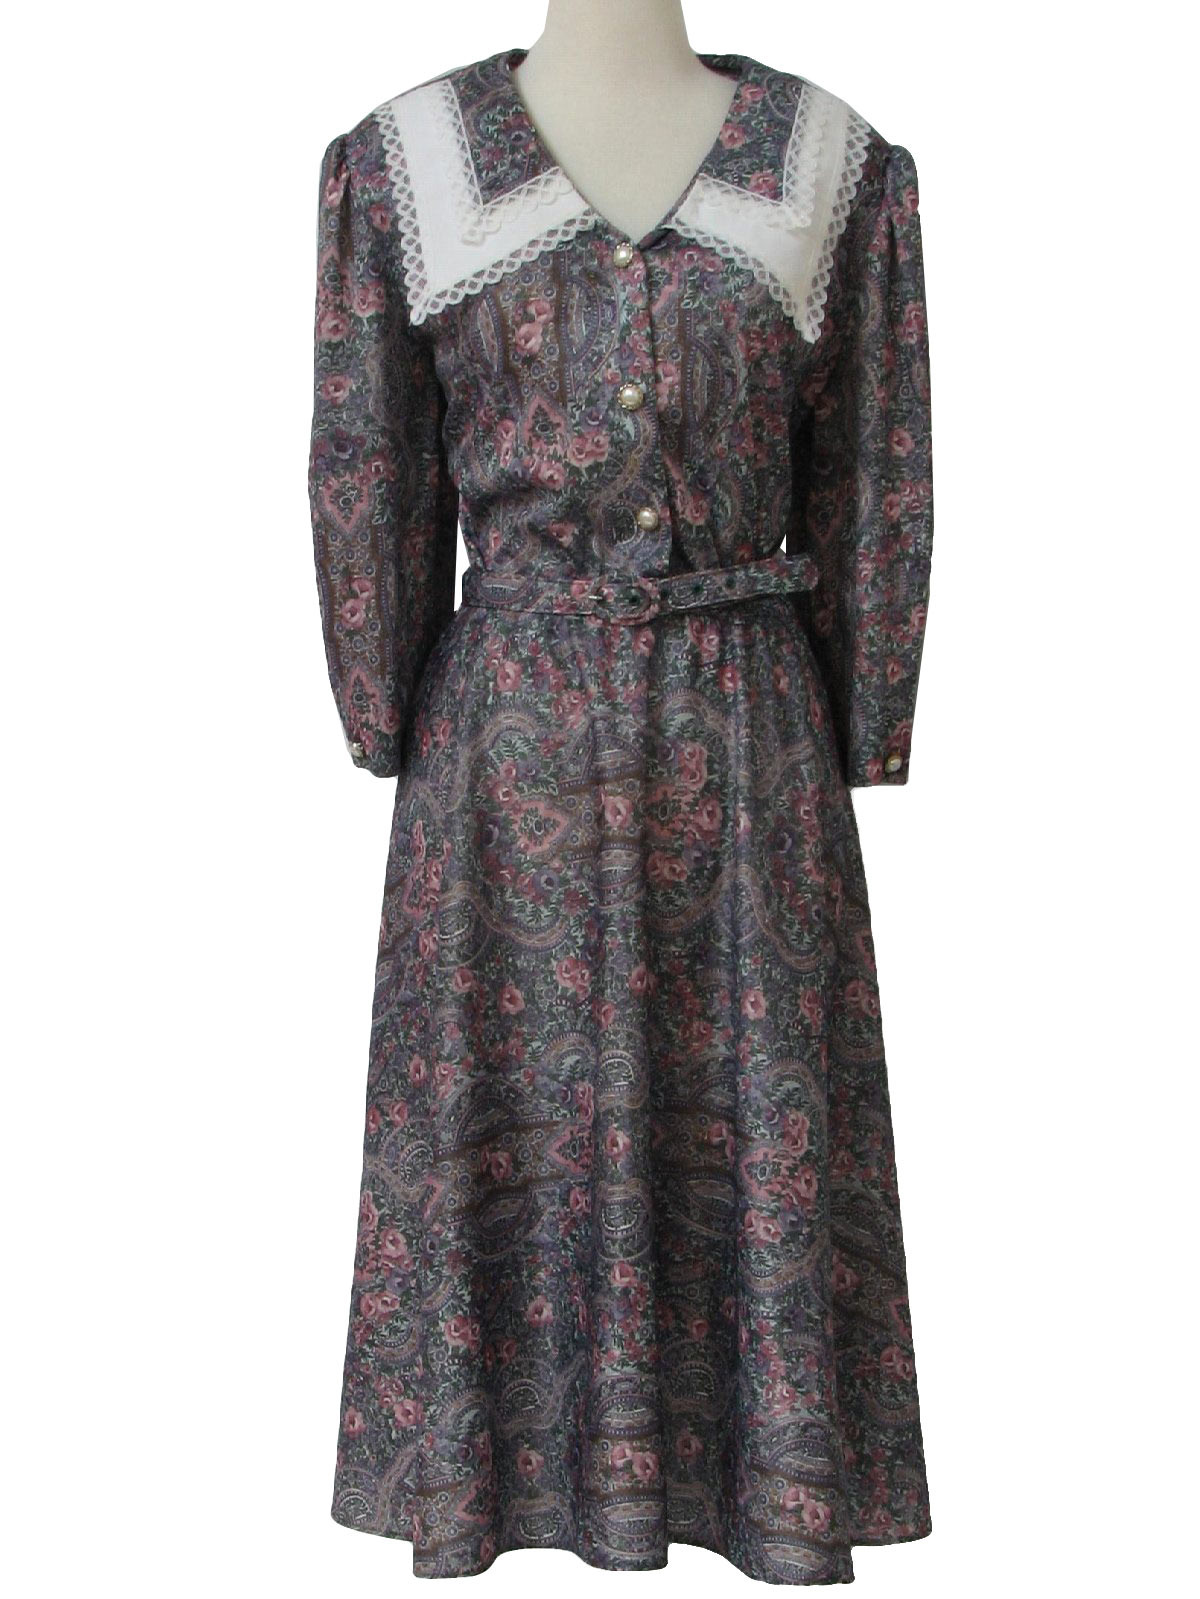 Retro Eighties Dress 80s Whirlaway Frocks Womens Silky